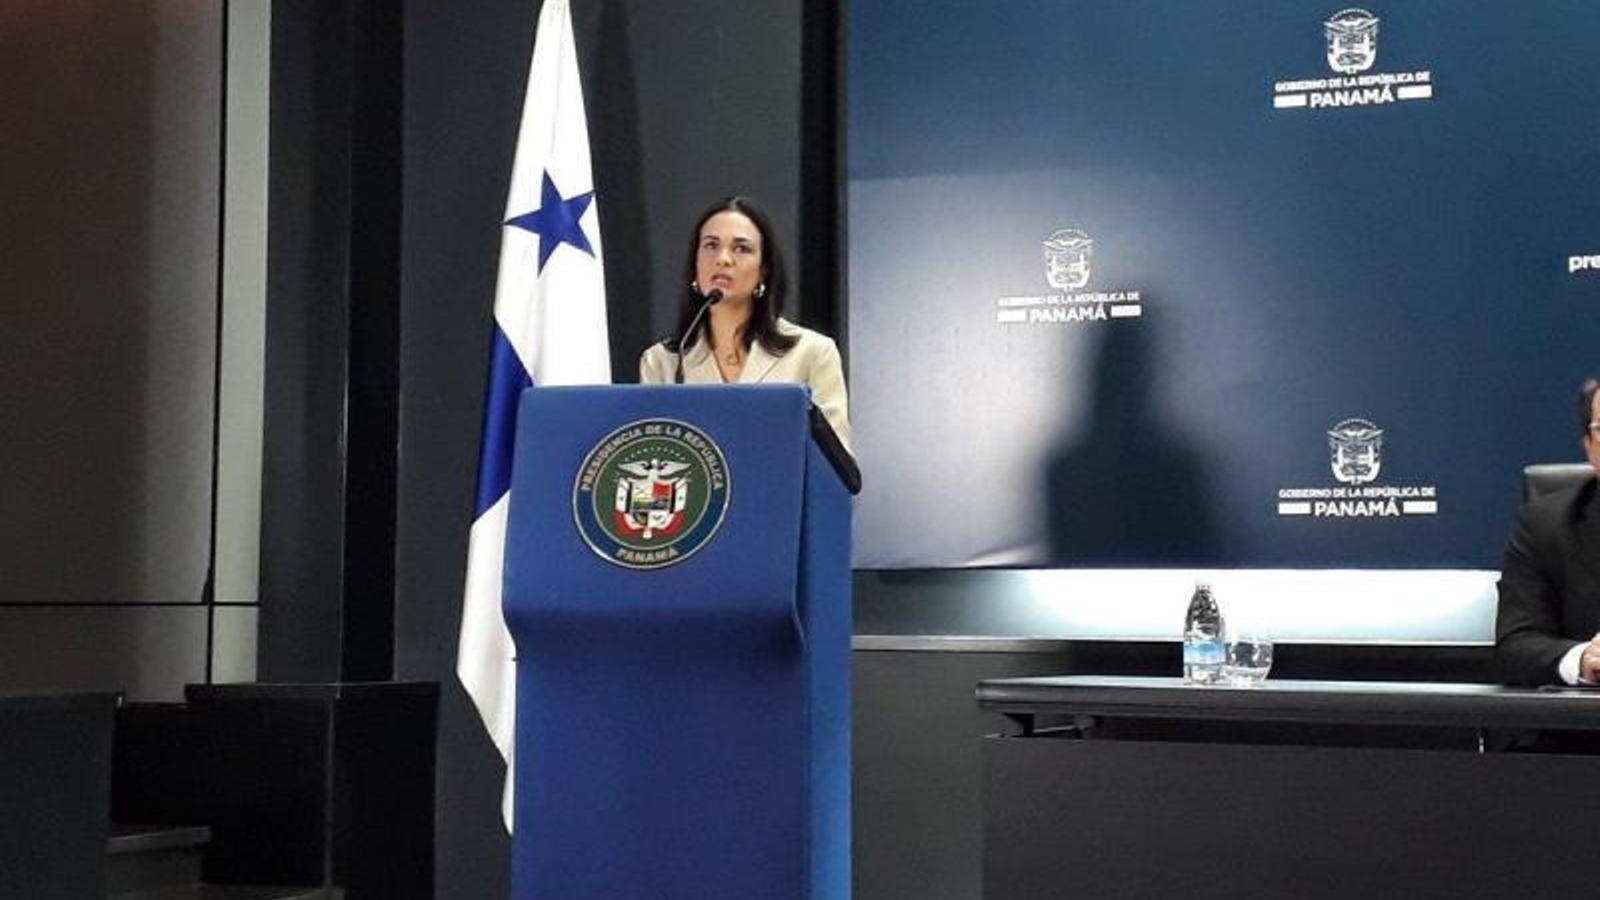 La vicepresidenta panamenya Isabel Saint Malo d'Alvarado. / ARA ANDORA